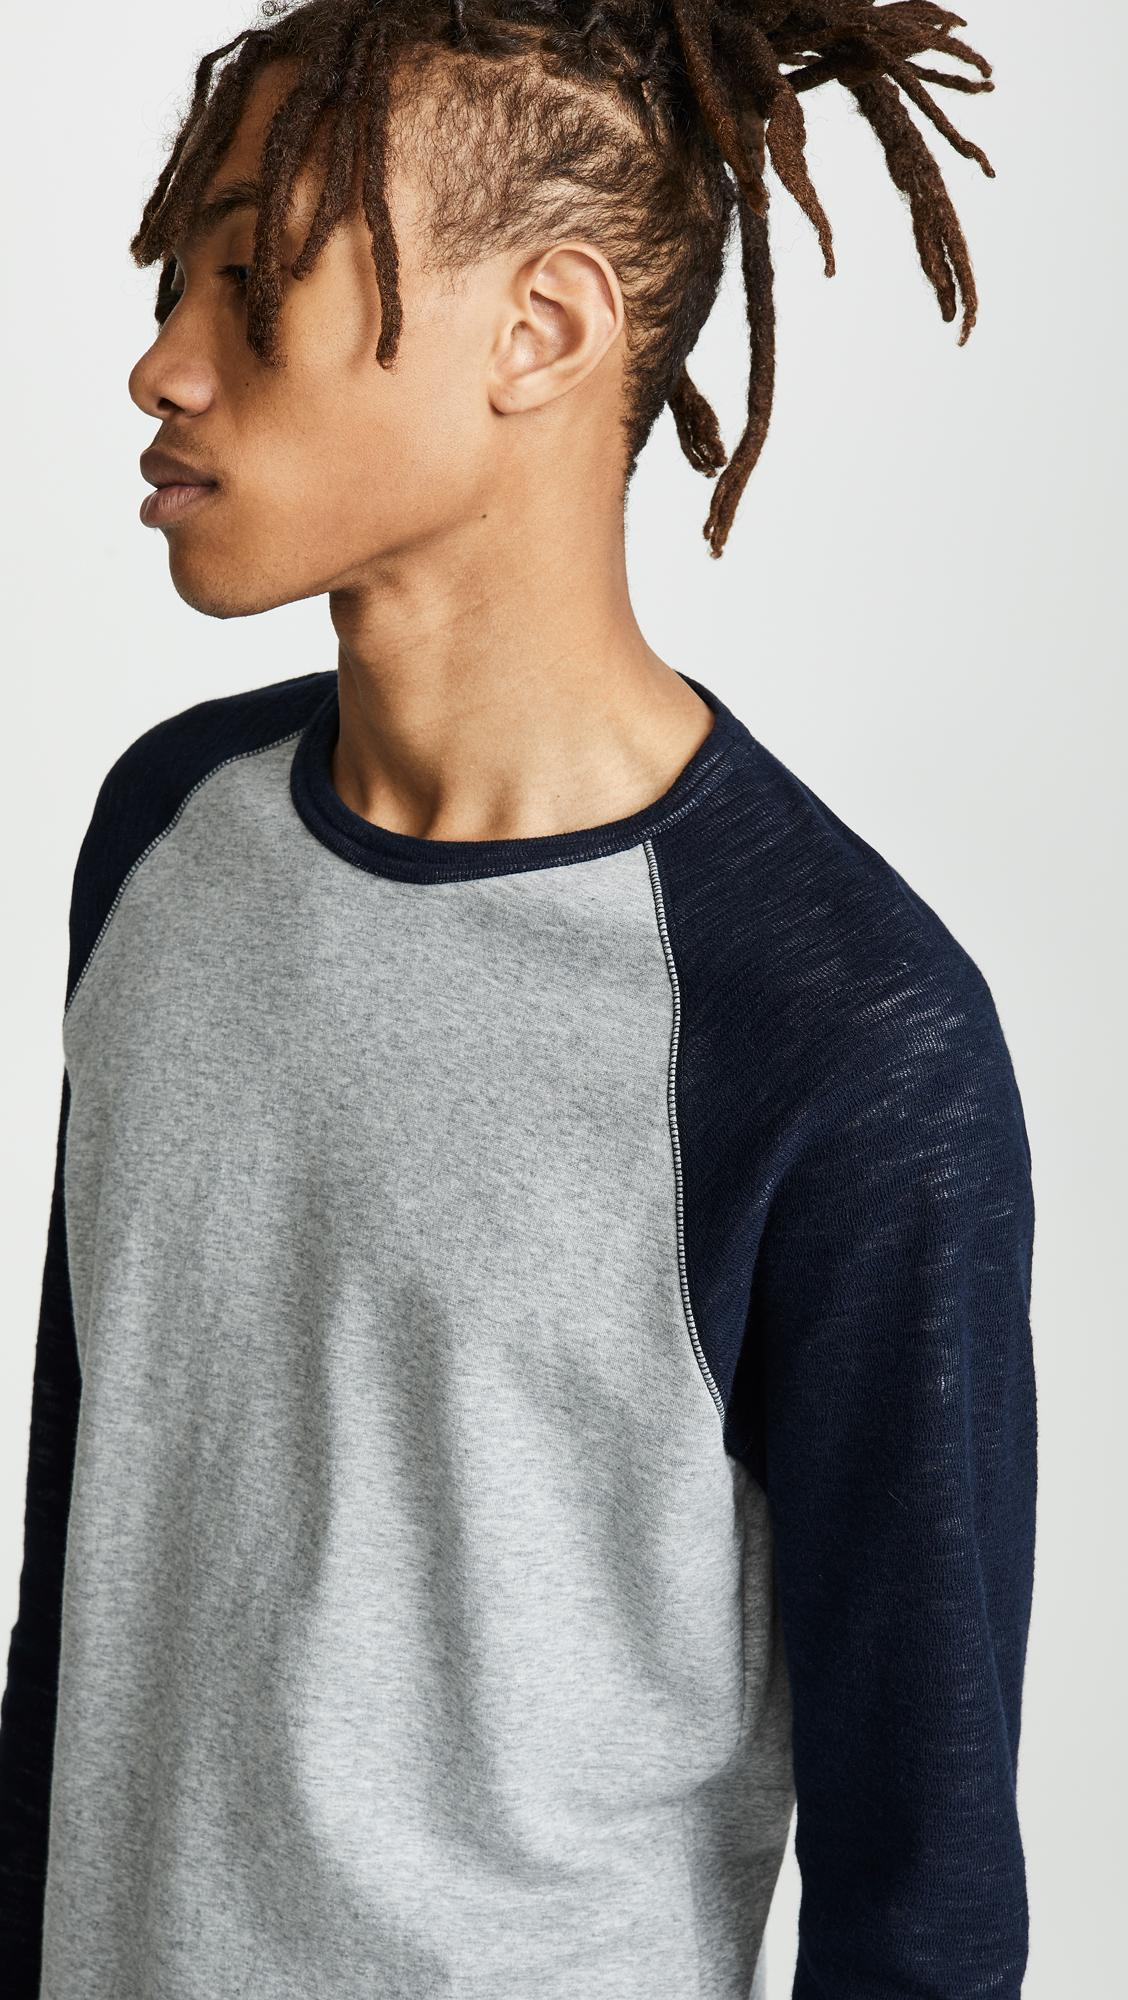 e51a7e5e355 Vince - Multicolor Colorblock Double Knit Crew Neck Shirt for Men - Lyst.  View fullscreen